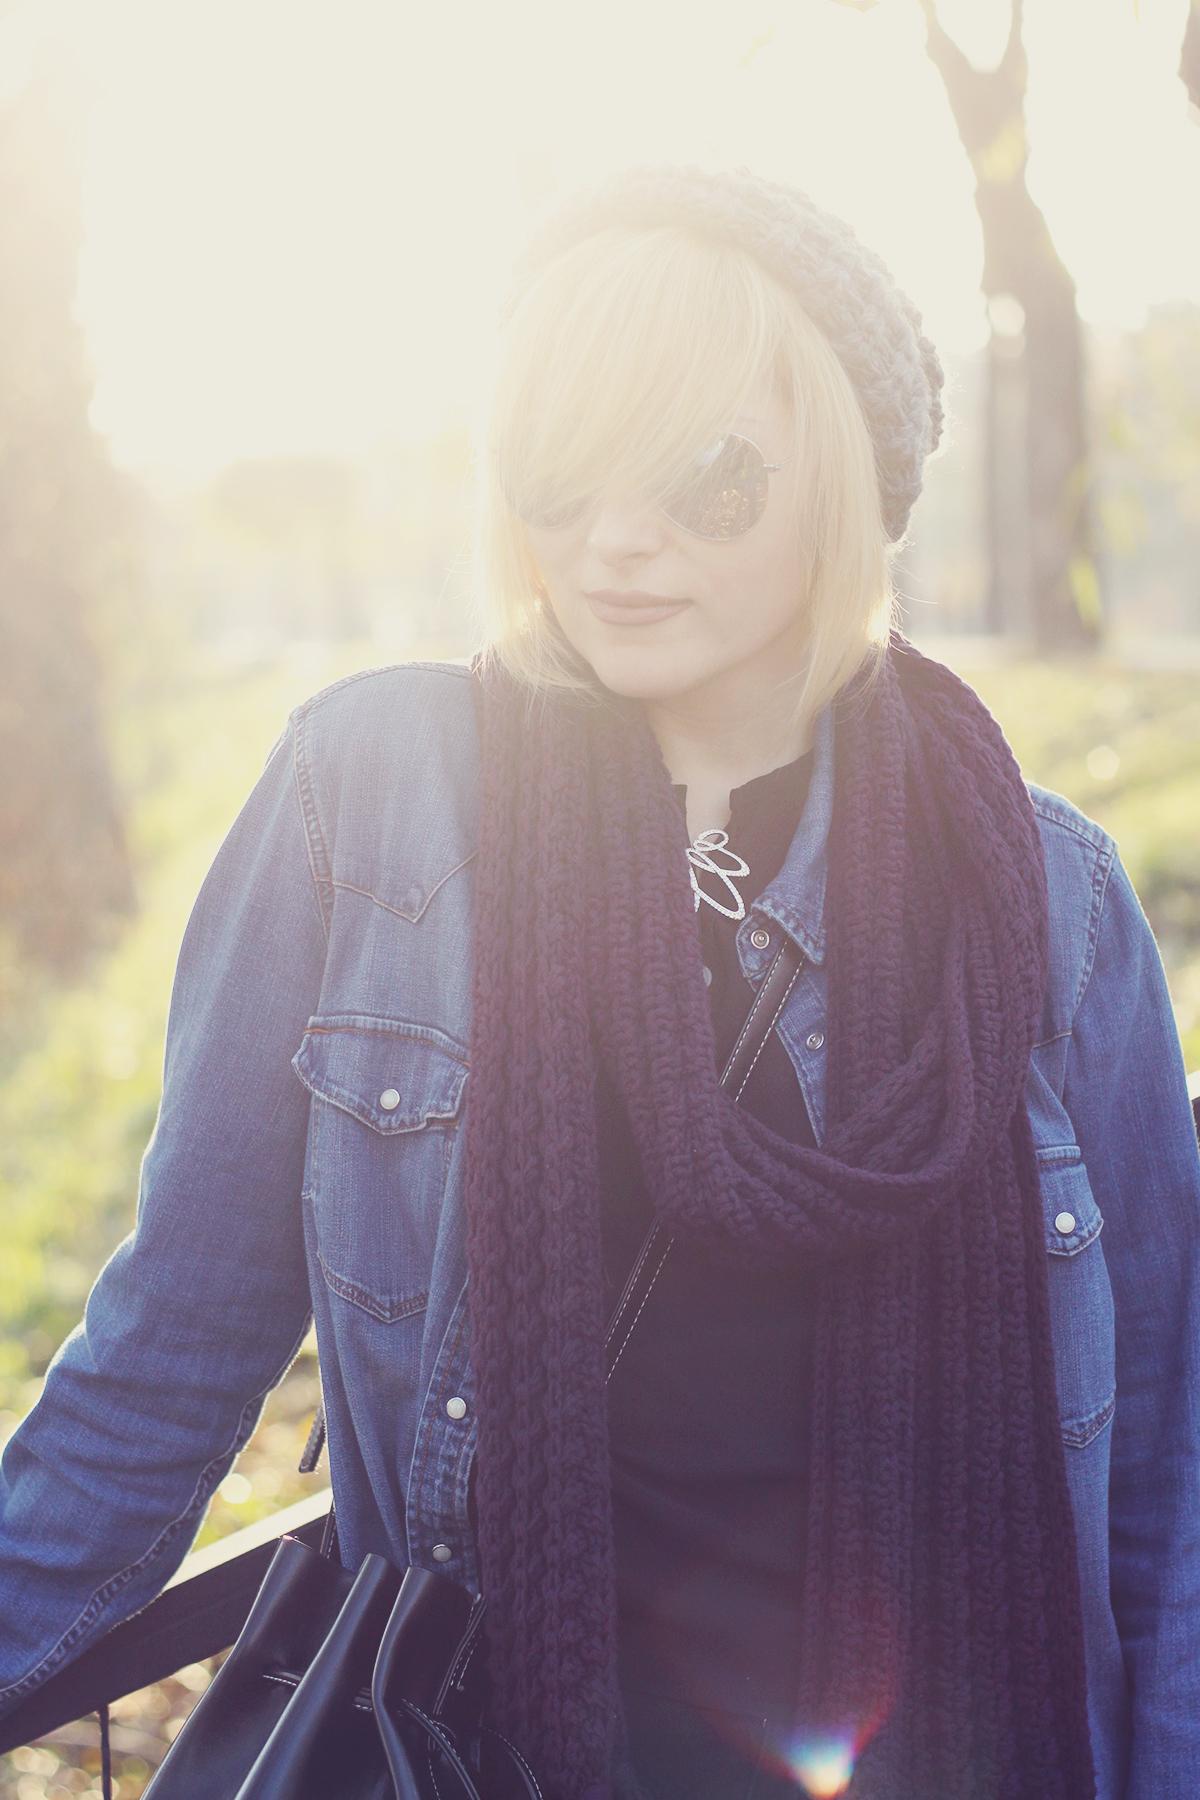 autumn, denim shirt,swarovski vintage brooch, knitted scarf and boho hat, fashionmia black top, bucket bag, aviator mirror sunglasses, blonde bob